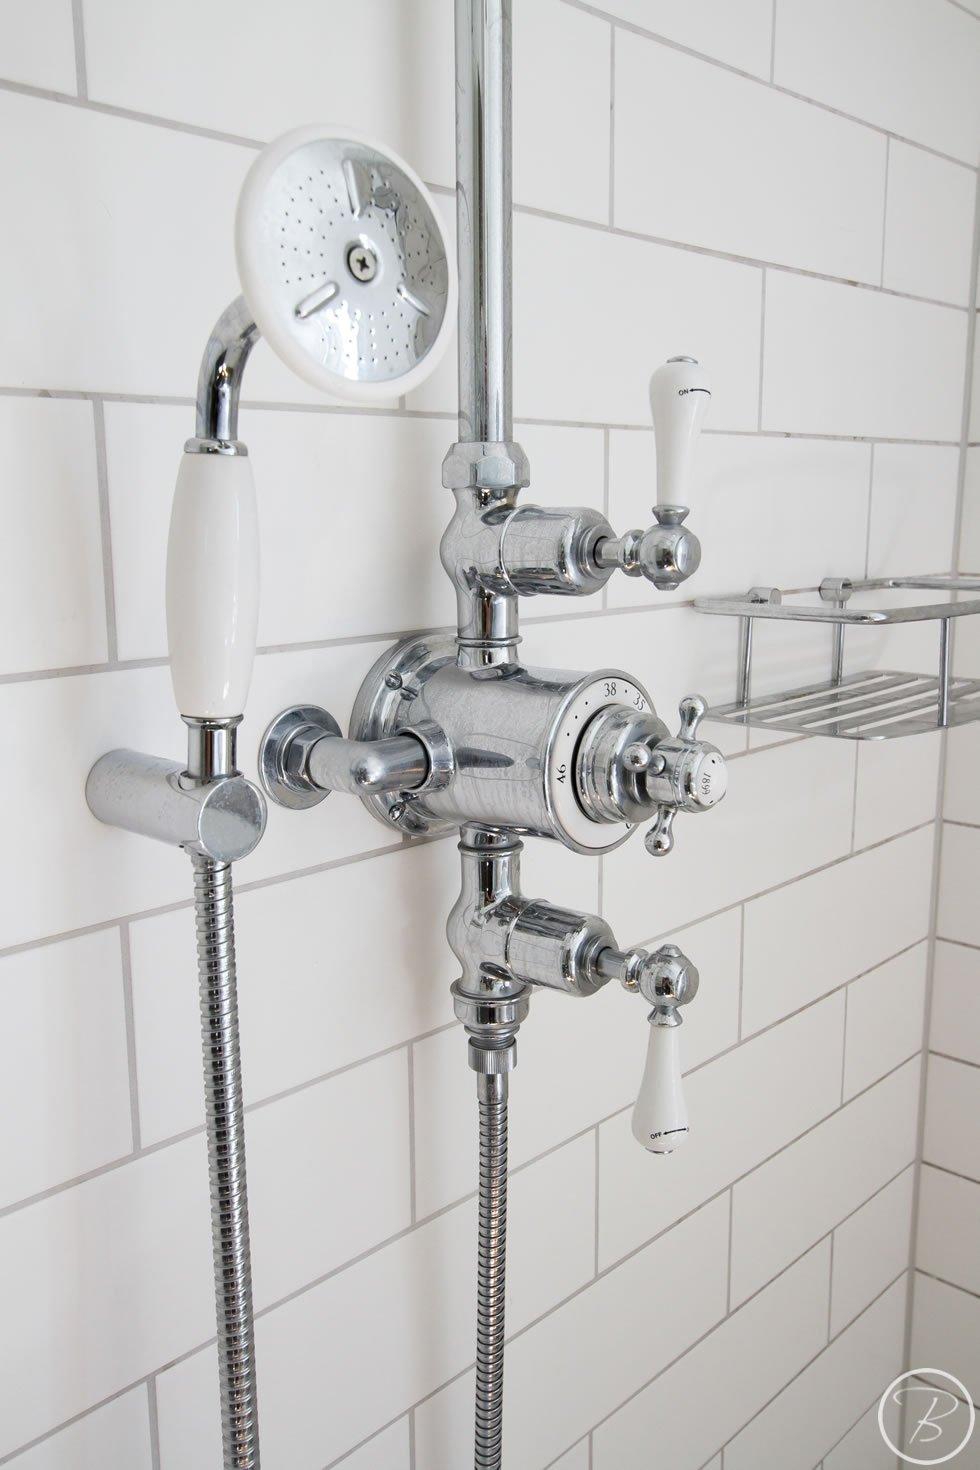 Holywell-Row-Bathroom-1-3